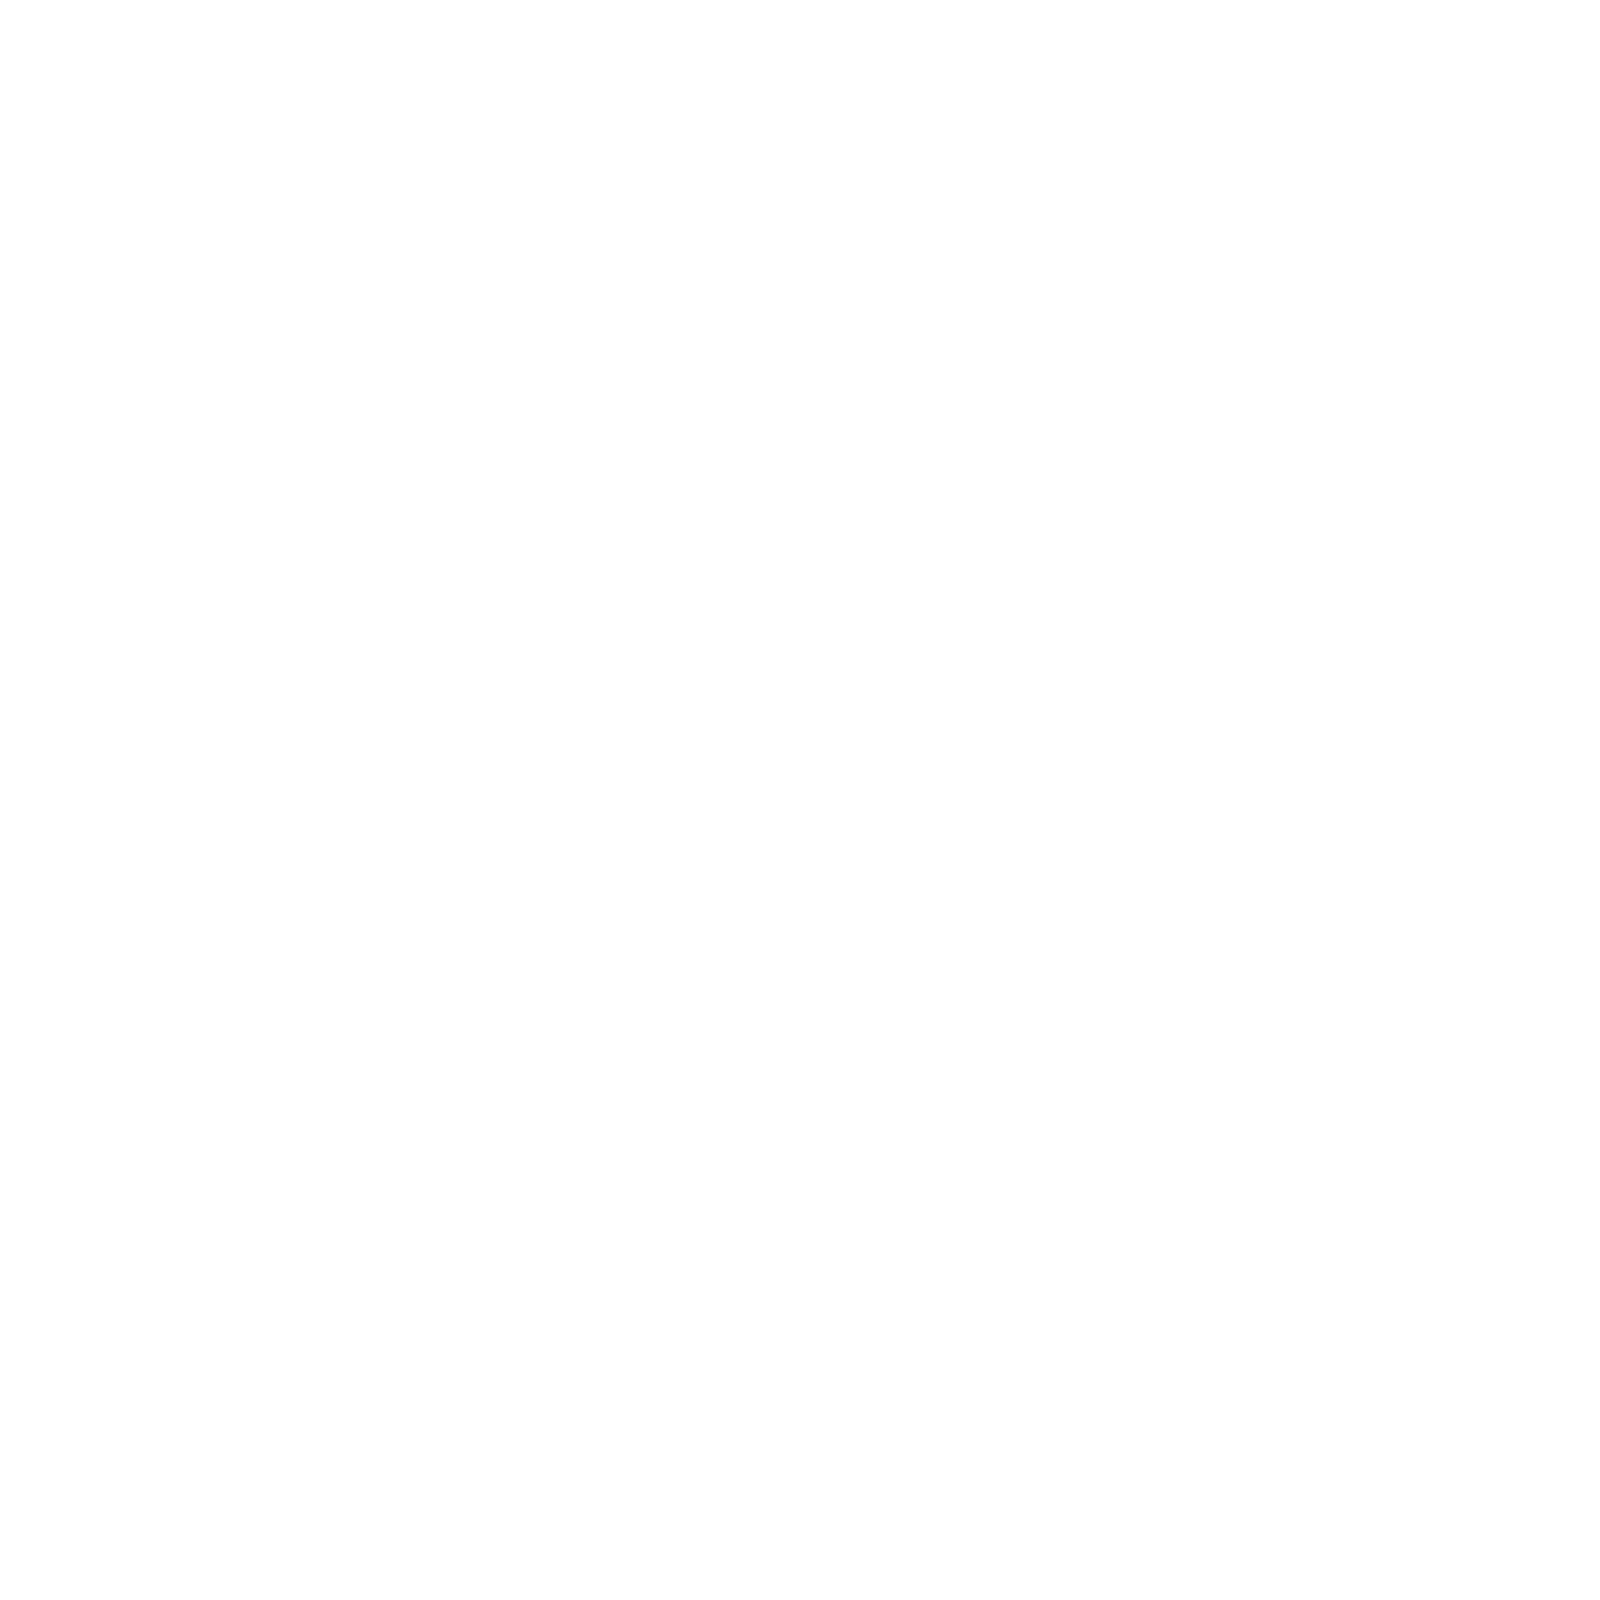 macquarie-project-logo